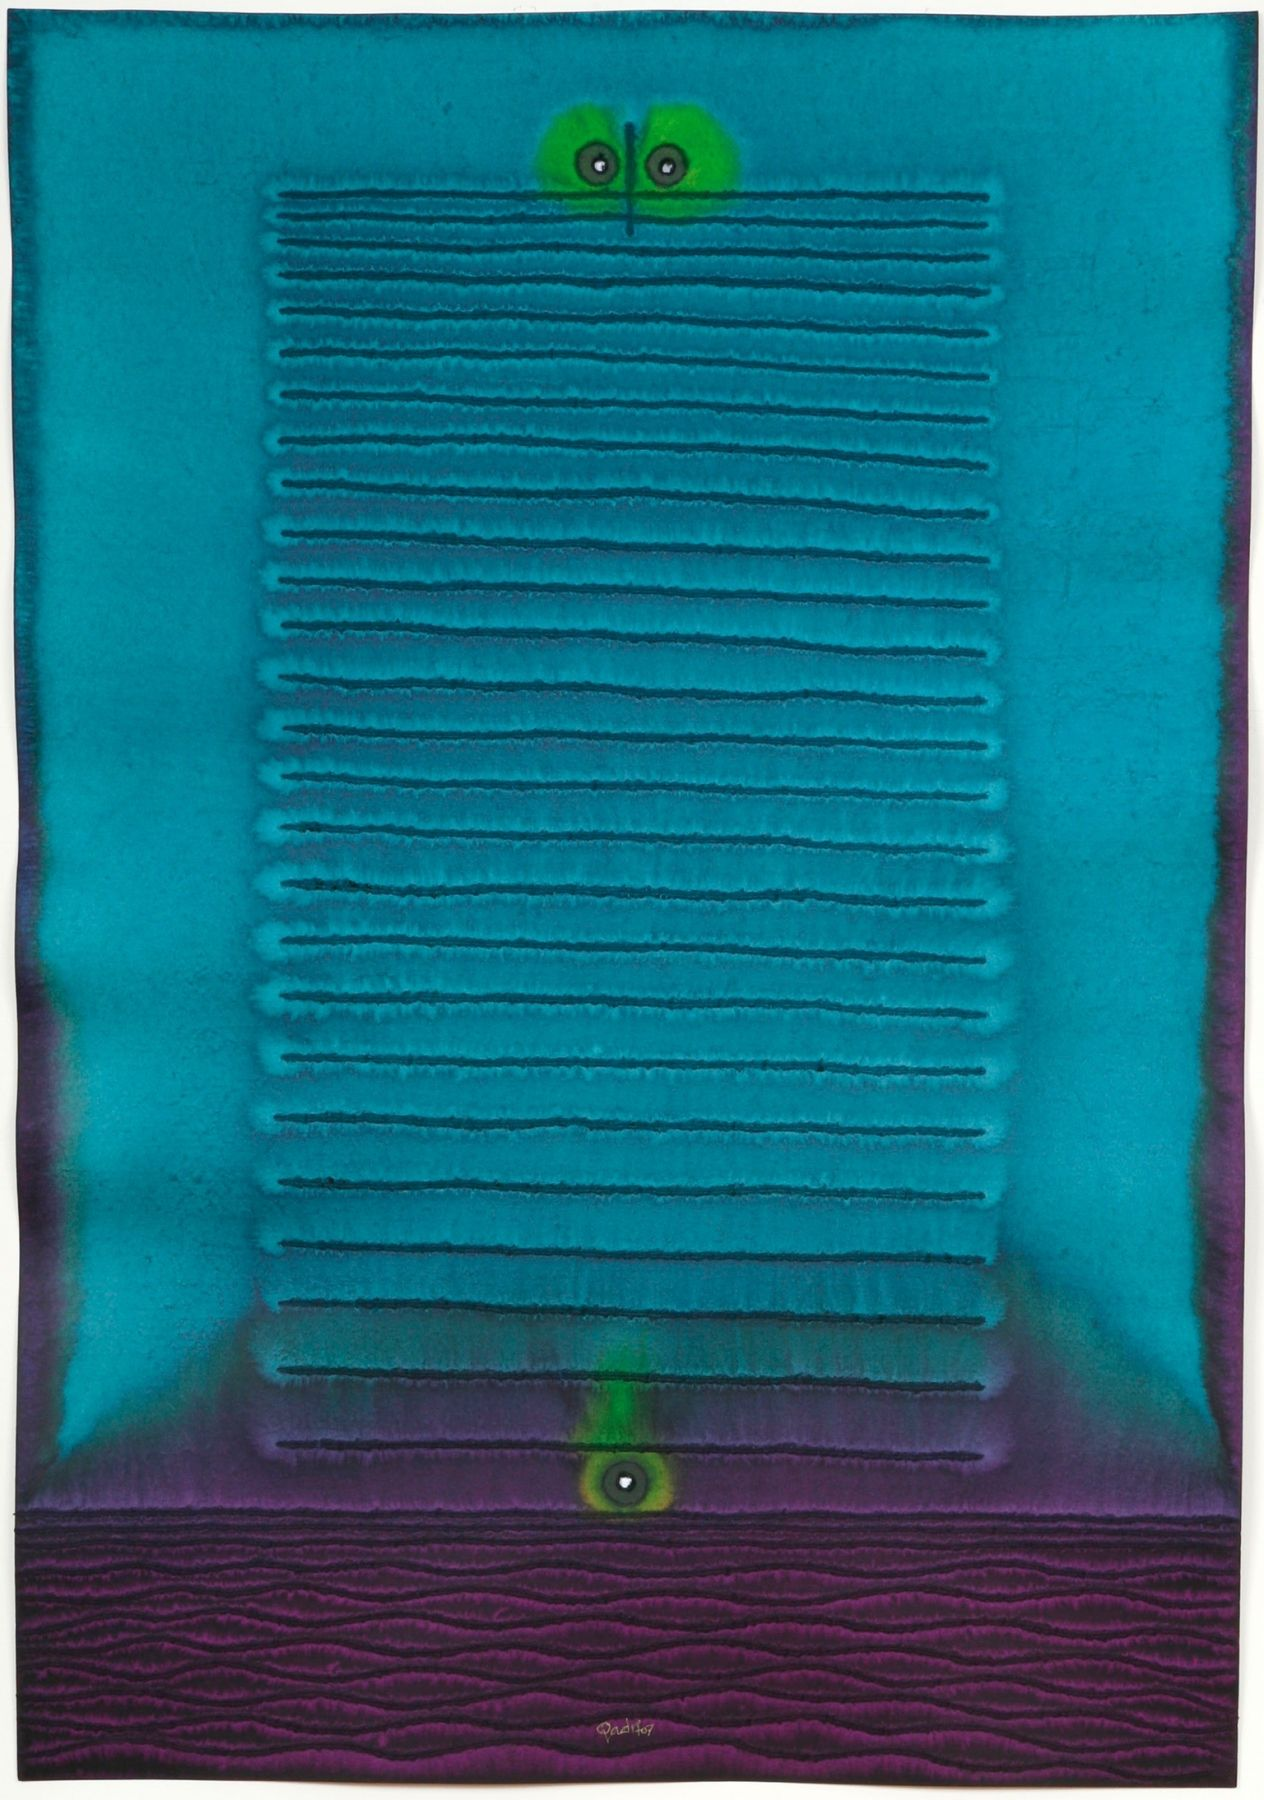 Sohan Qadri, Deva 1, 2006, ink and dye on paper, 39 x 27 inches / 99.06 x 68.58 cm.